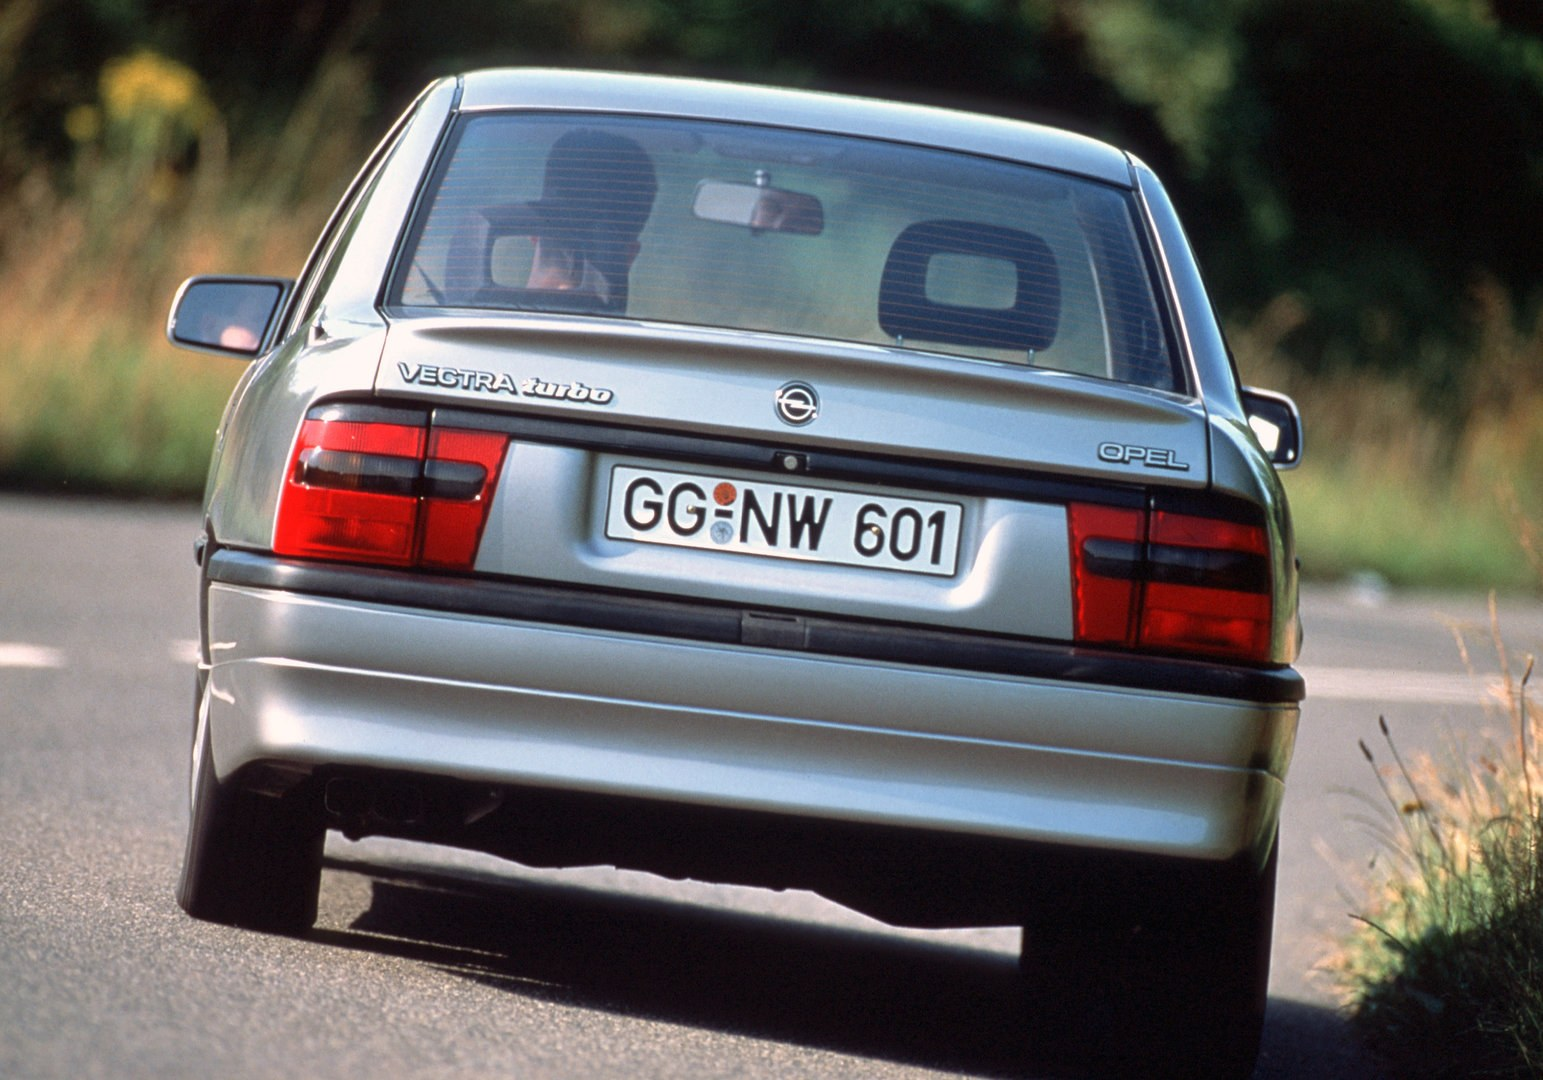 Opel Vectra A Turbo 4x4 3